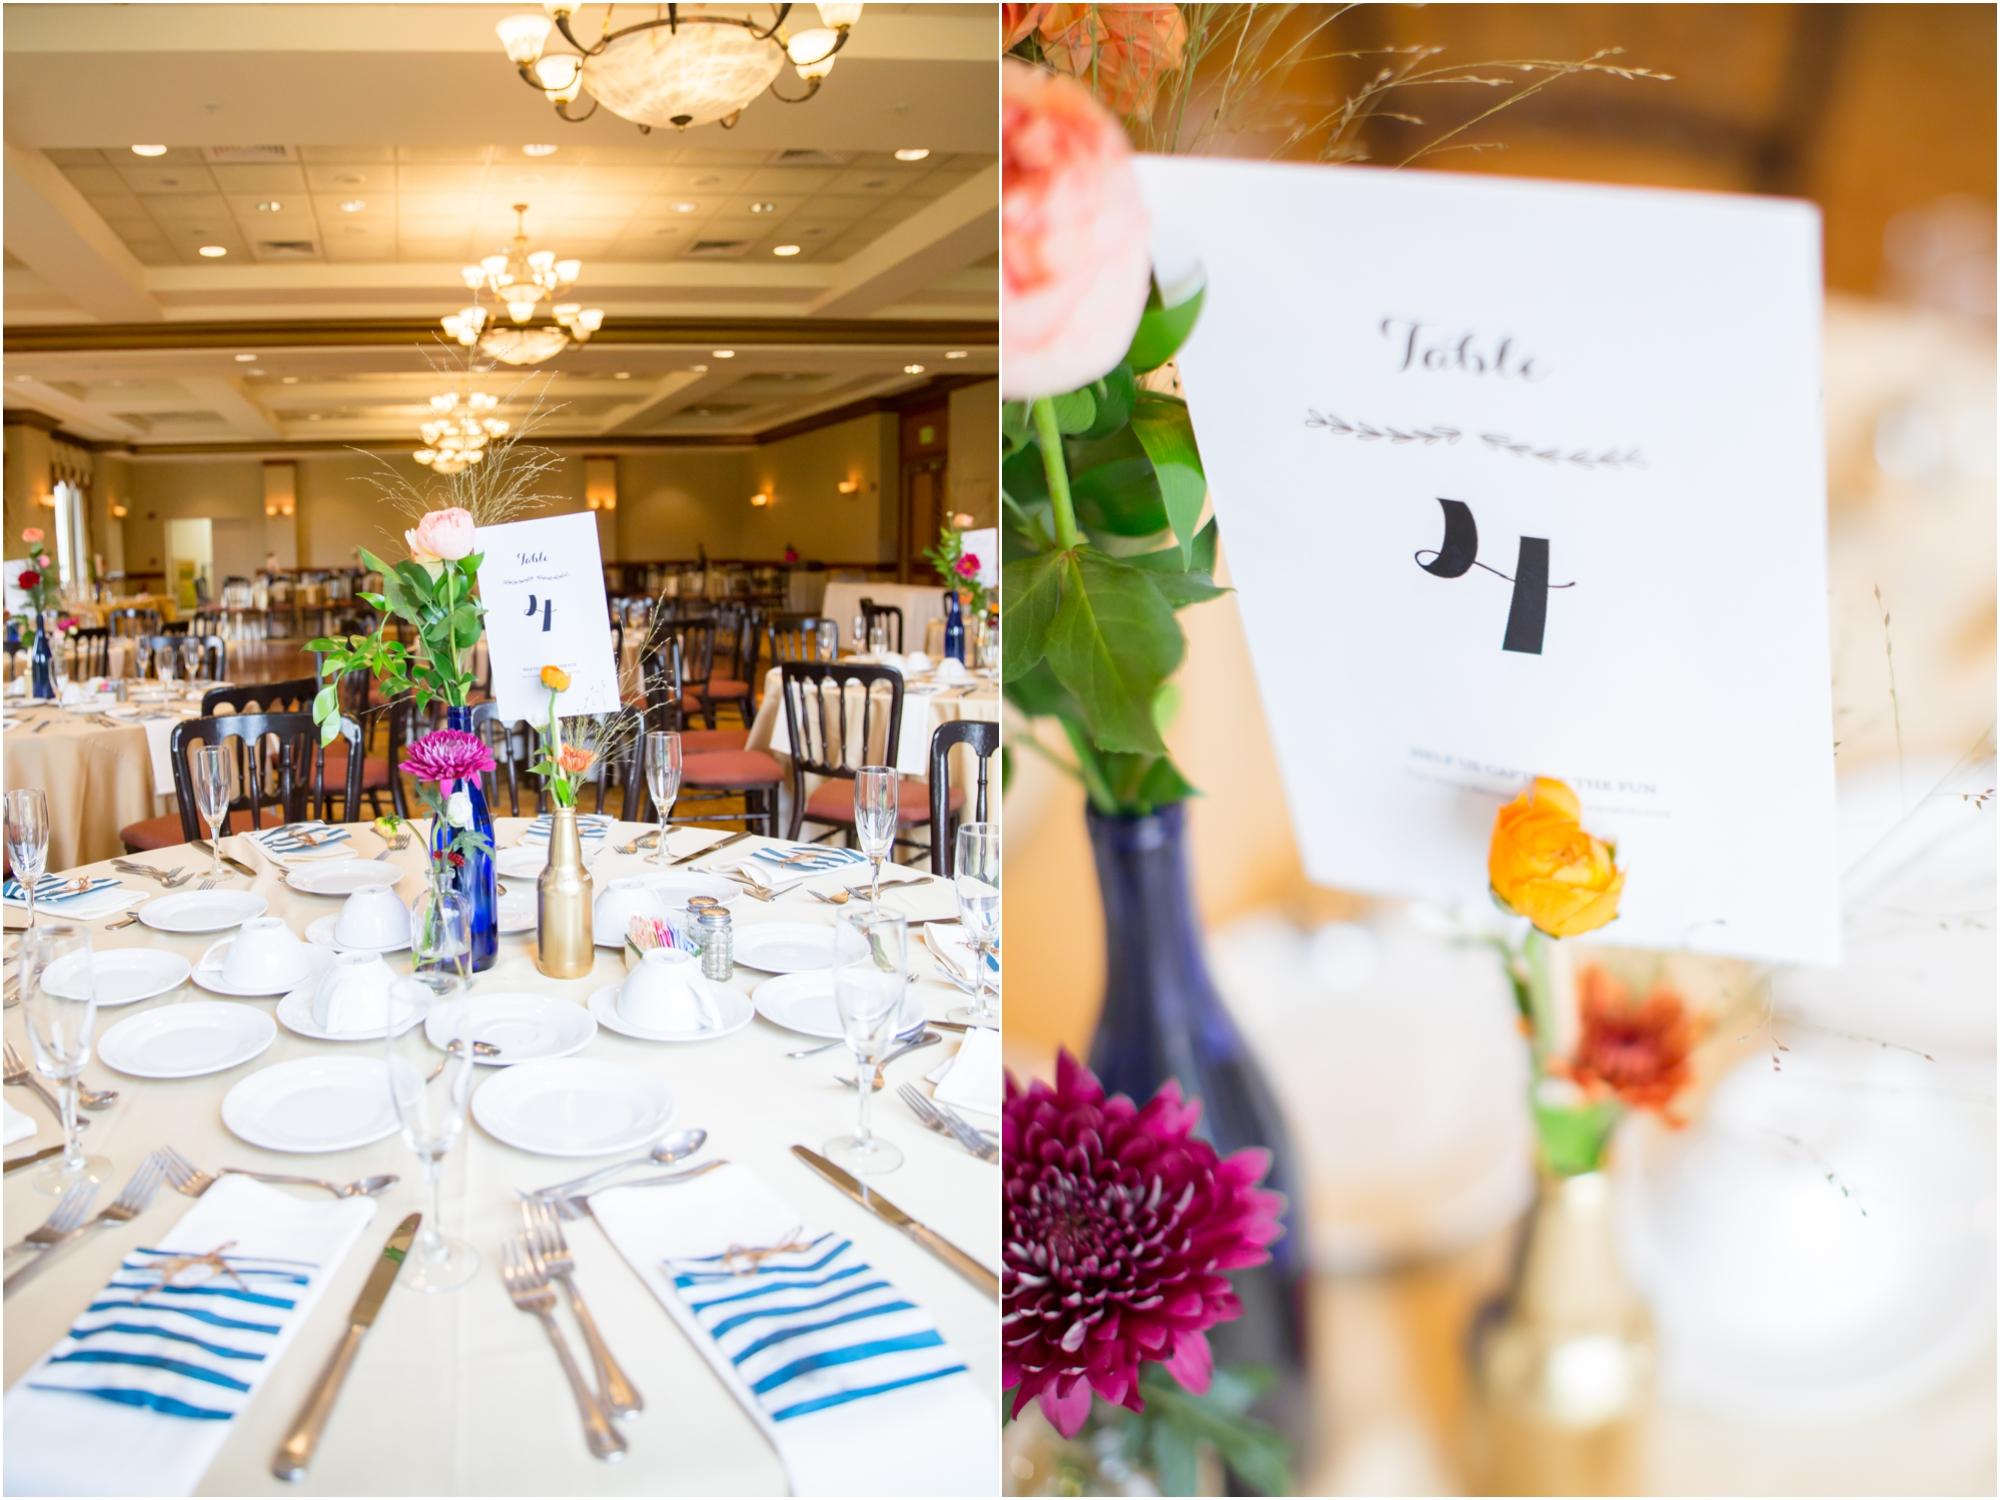 6-Finkel Wedding Reception-550_anna grace photography maryland wedding photographer turf valley.jpg